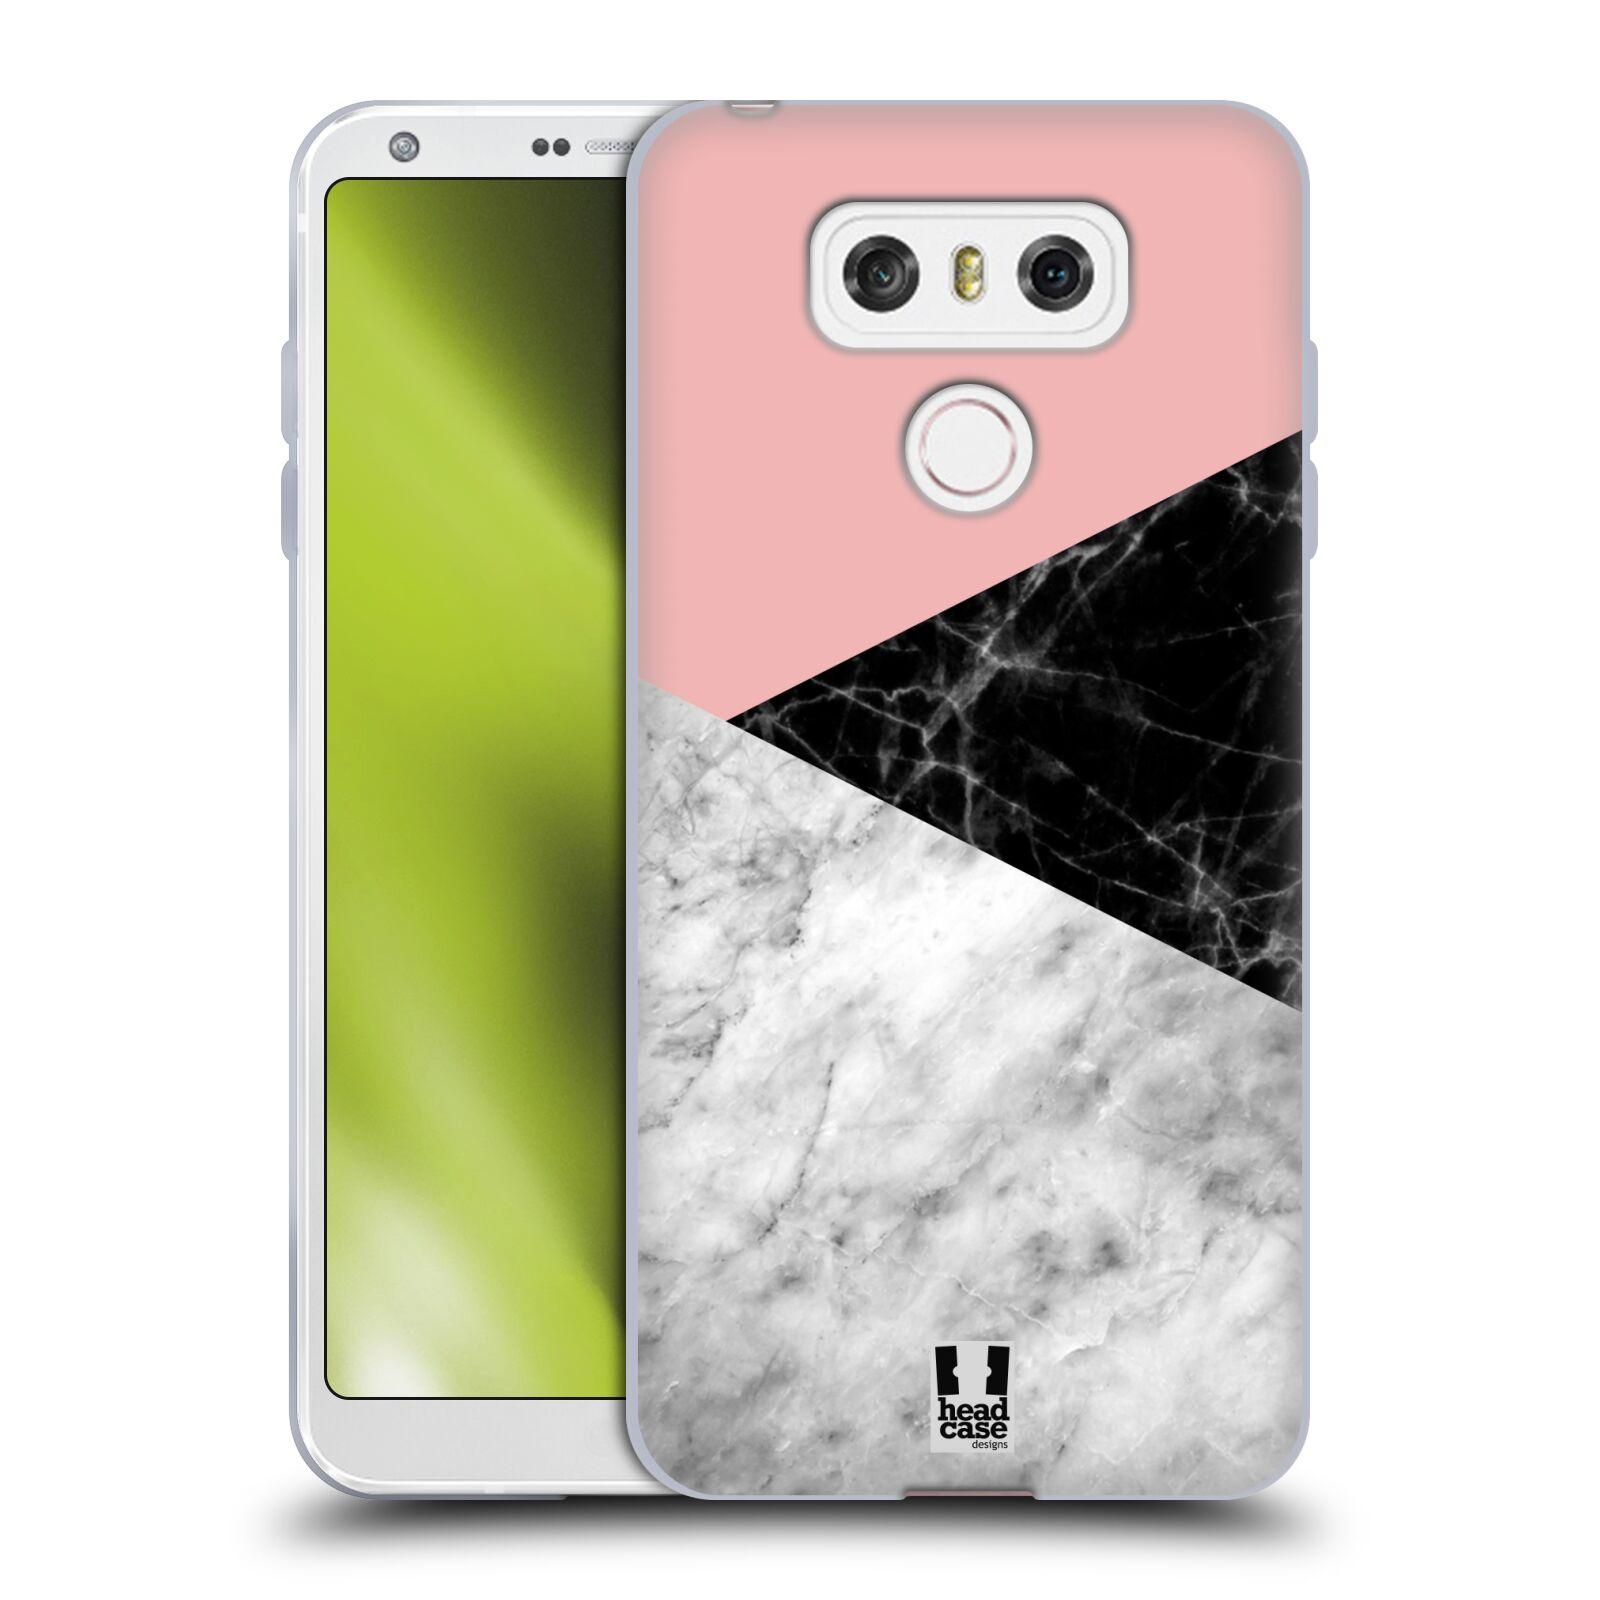 Silikonové pouzdro na mobil LG G6 - Head Case - Mramor mix